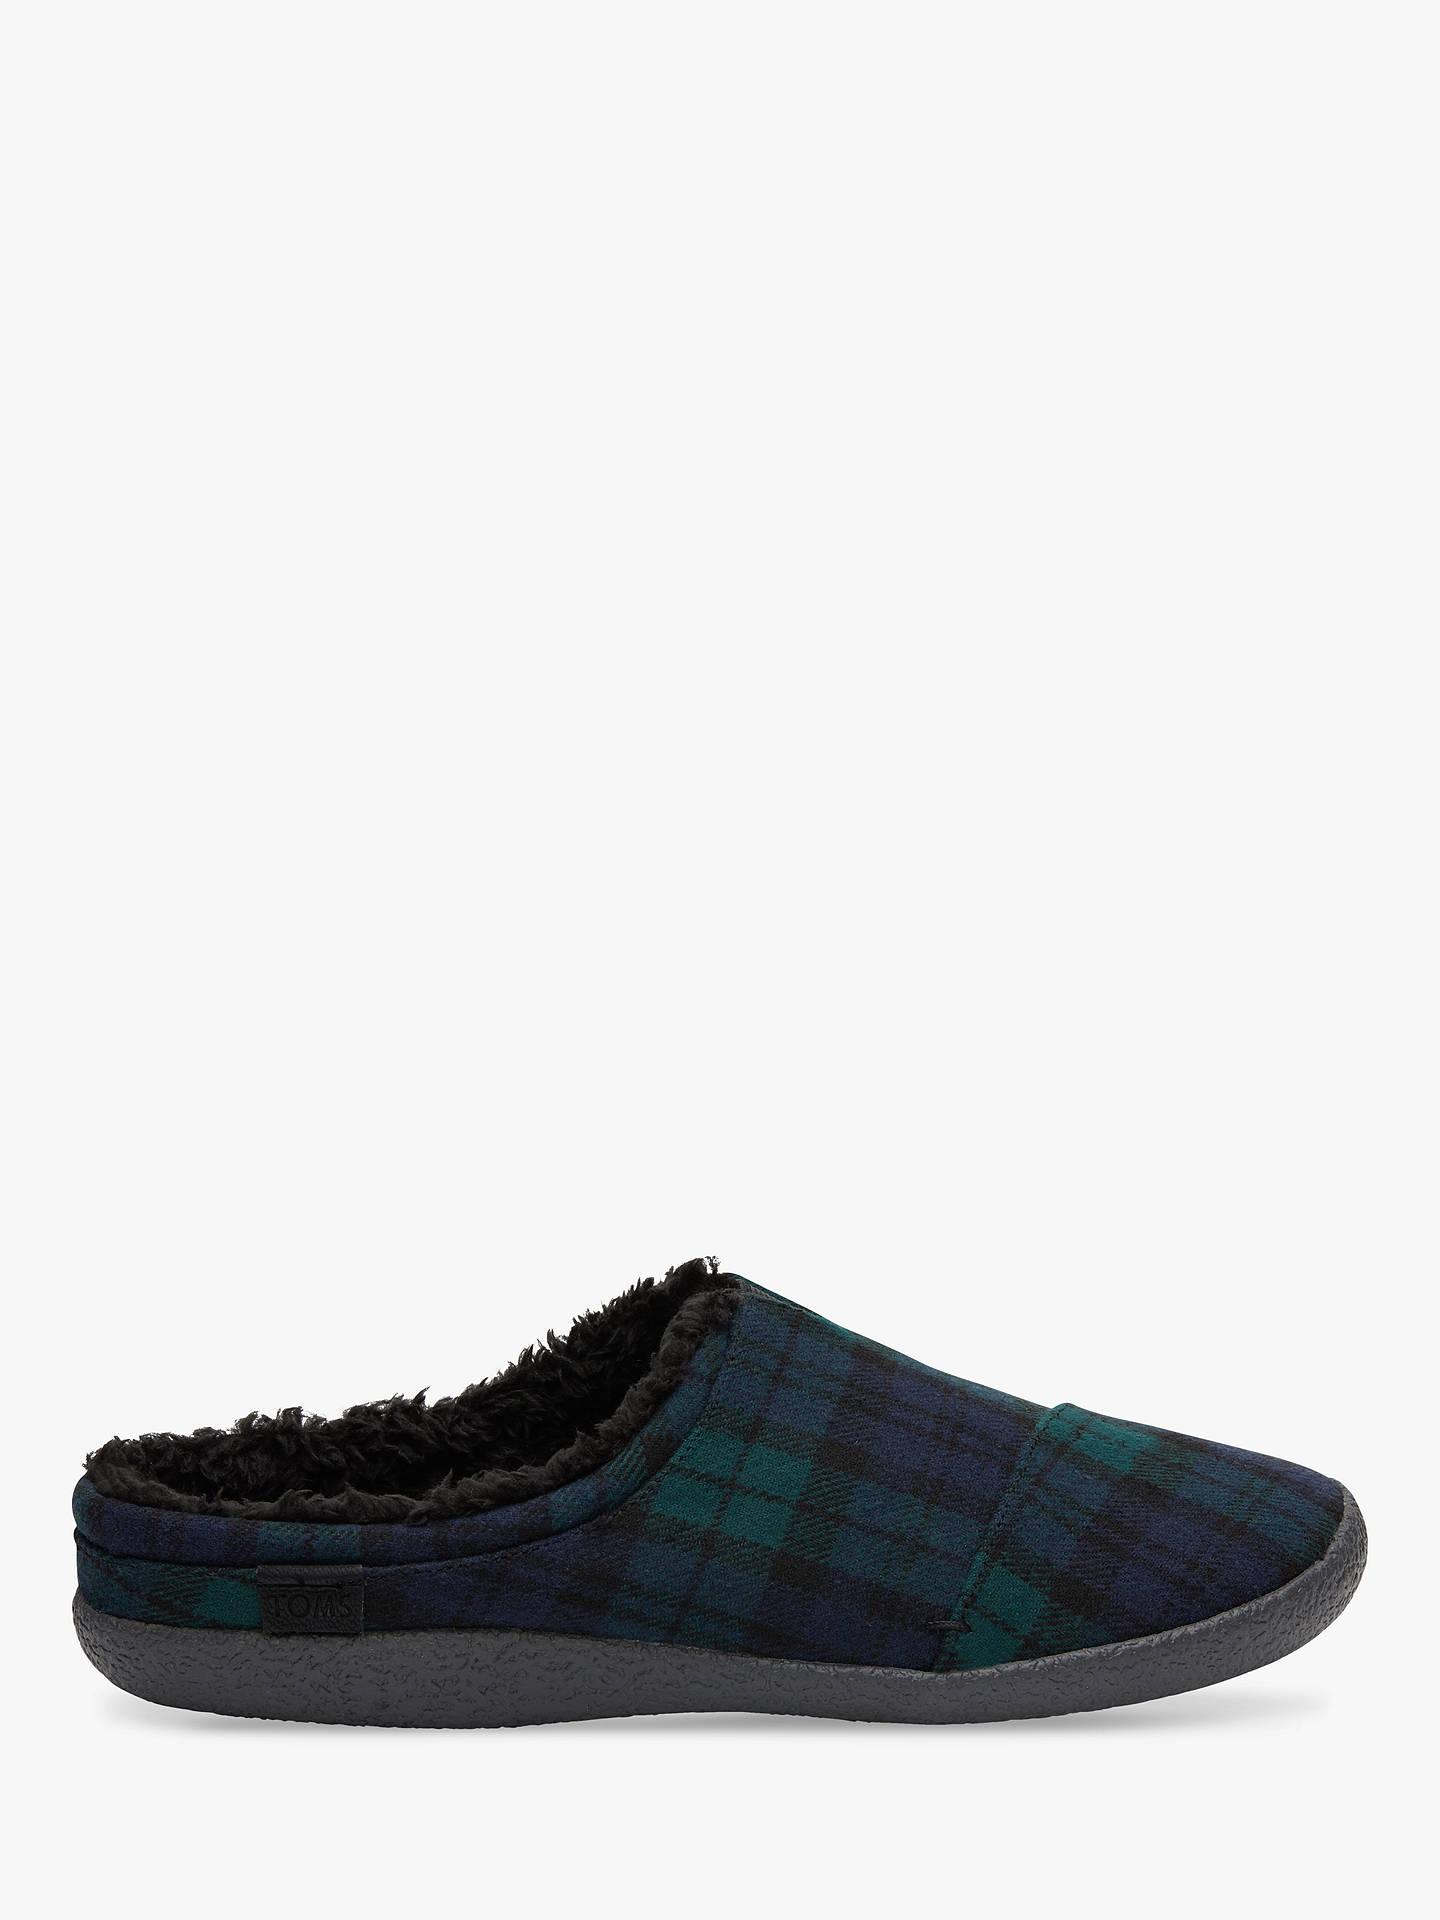 a826eb14a41 Buy TOMS Berkeley Plaid Felt Slippers